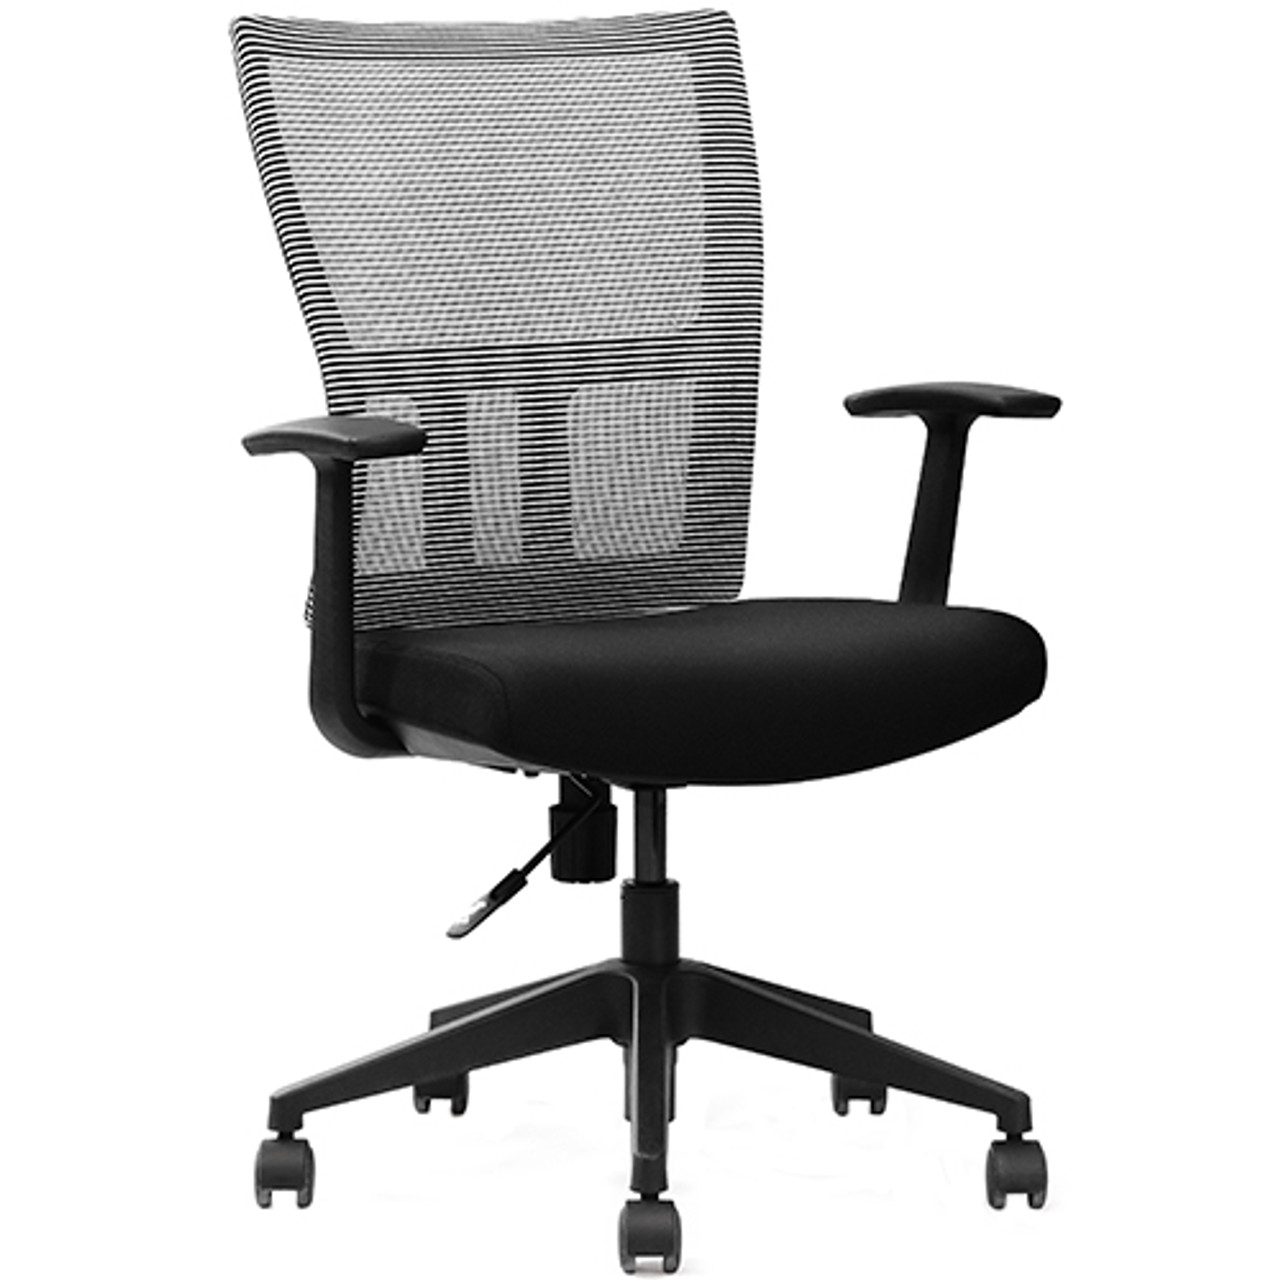 Advantage Black Mesh Office Chairs M1 Be